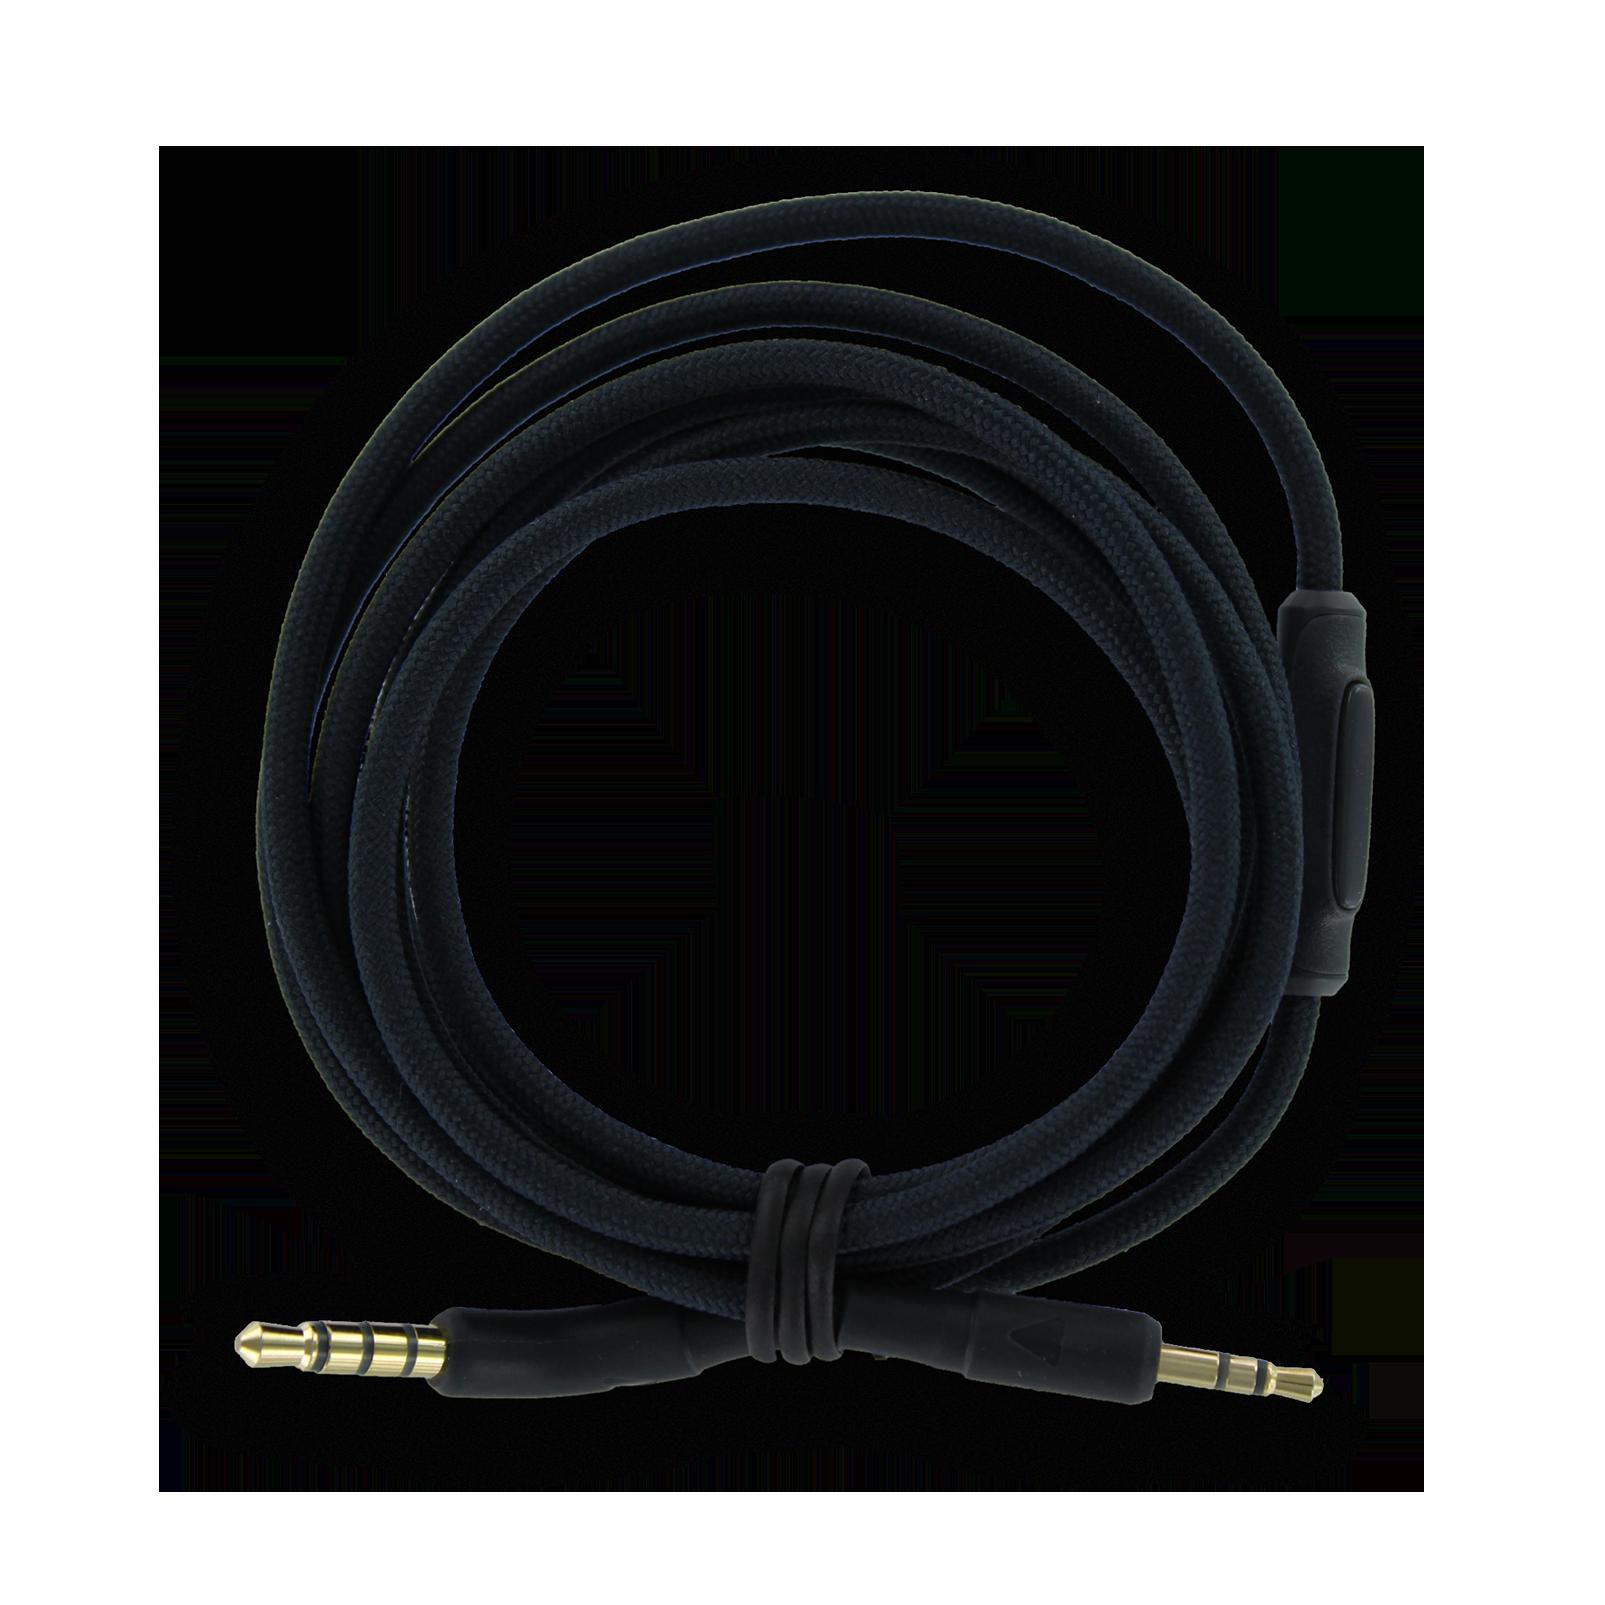 Audio cable for E55BTQE - Black - Audio cable, 130cm - Hero